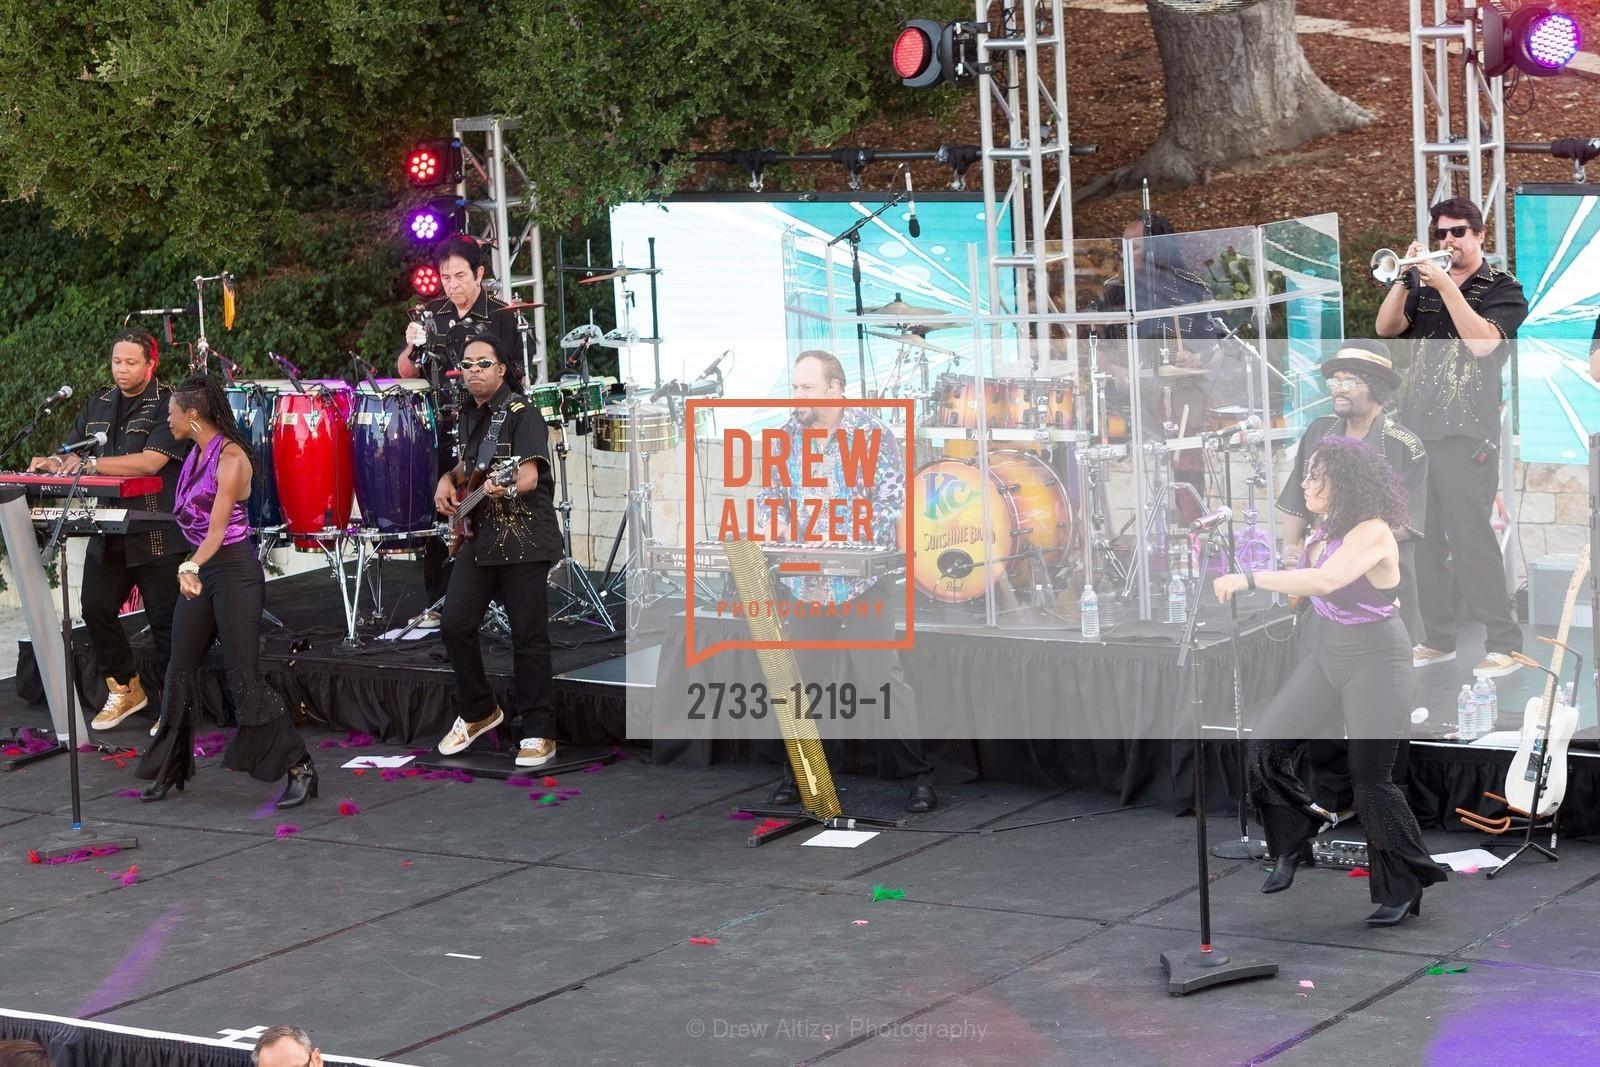 KC And The Sunshine Band, Photo #2733-1219-1